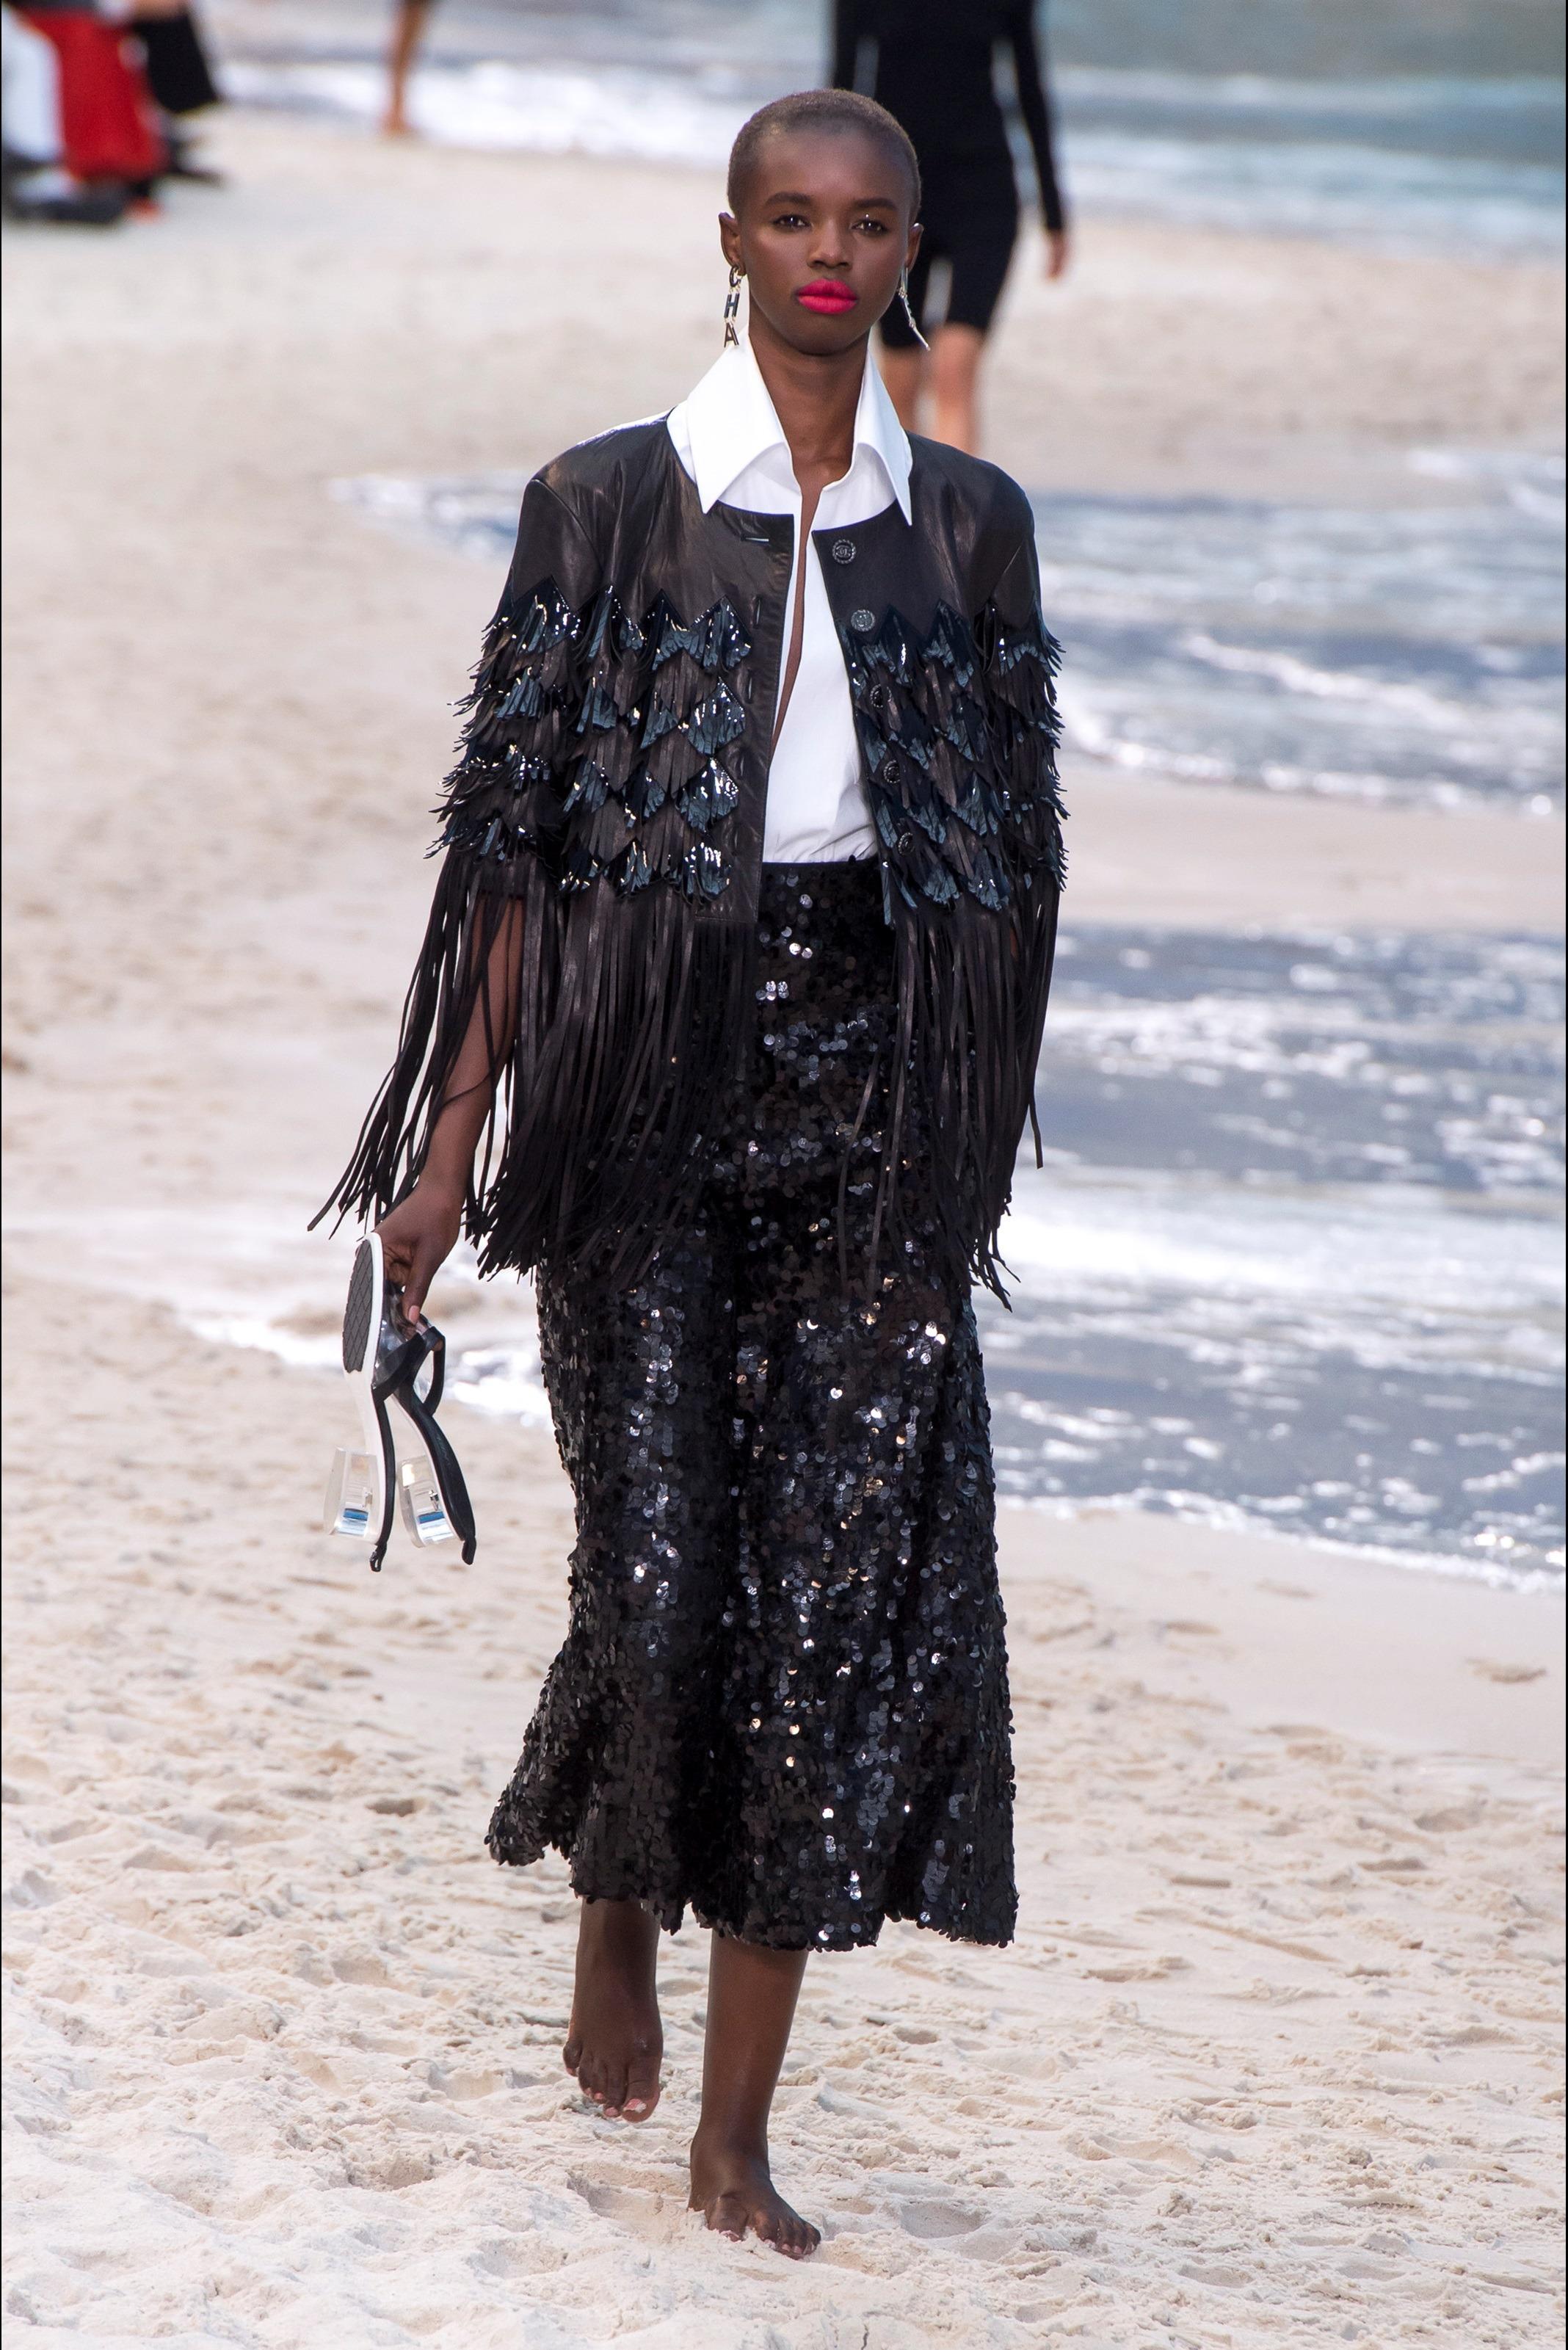 Chanel Outfit Nero Con Paillettes